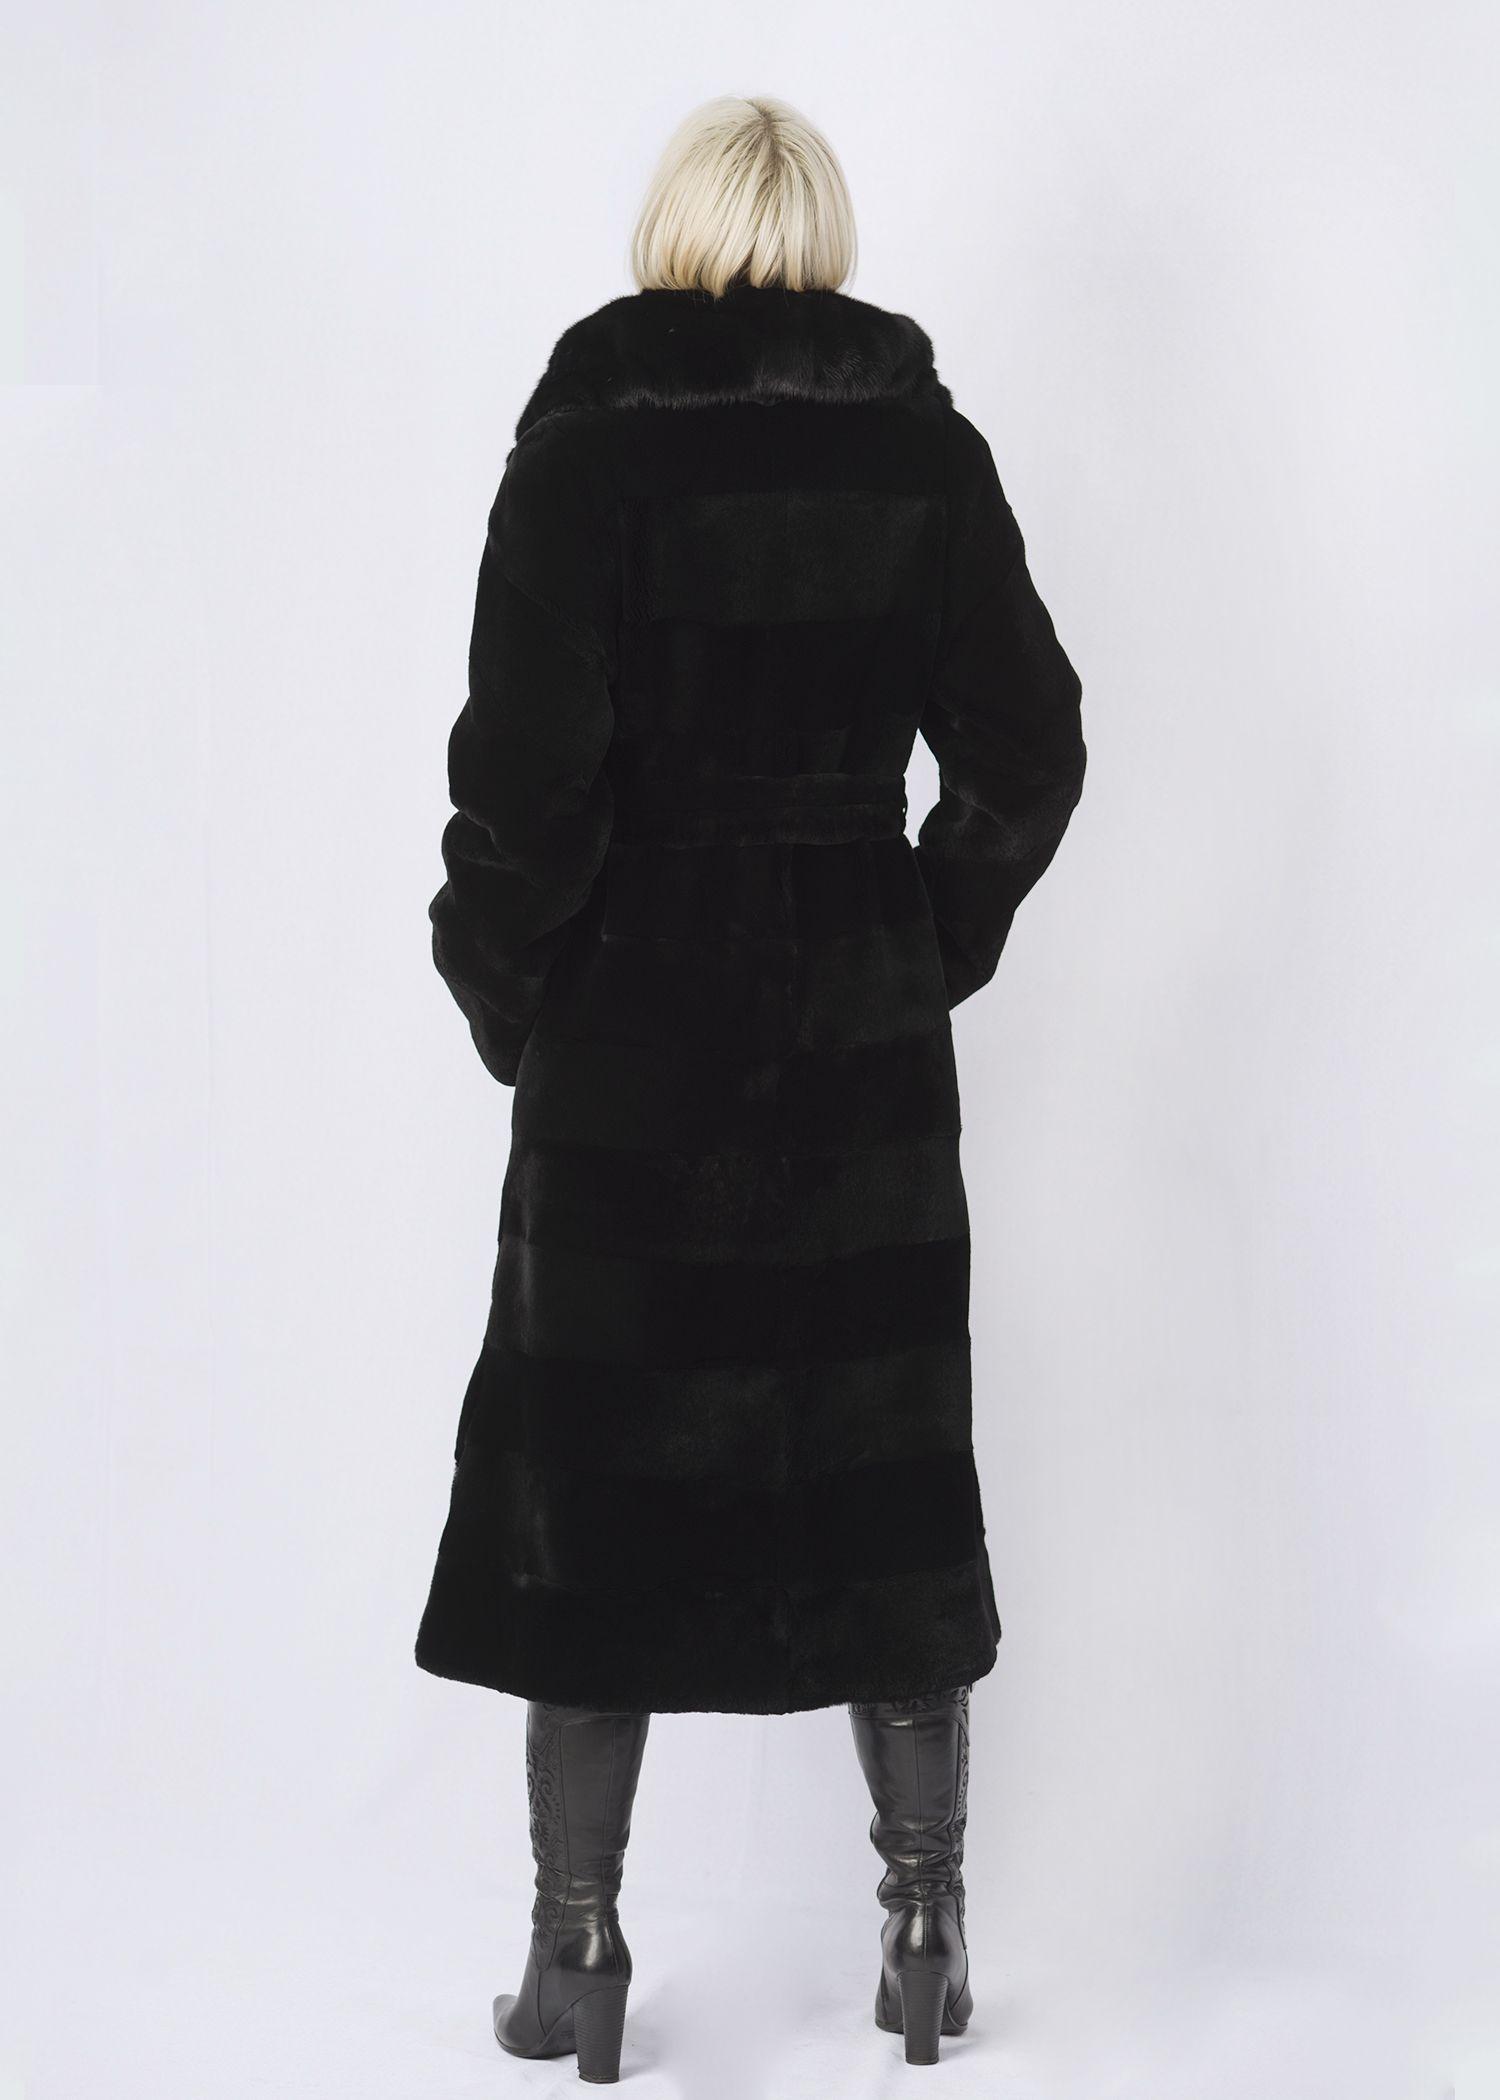 Шуба женская из бобрика(rex) ОА1257-1 фото №1